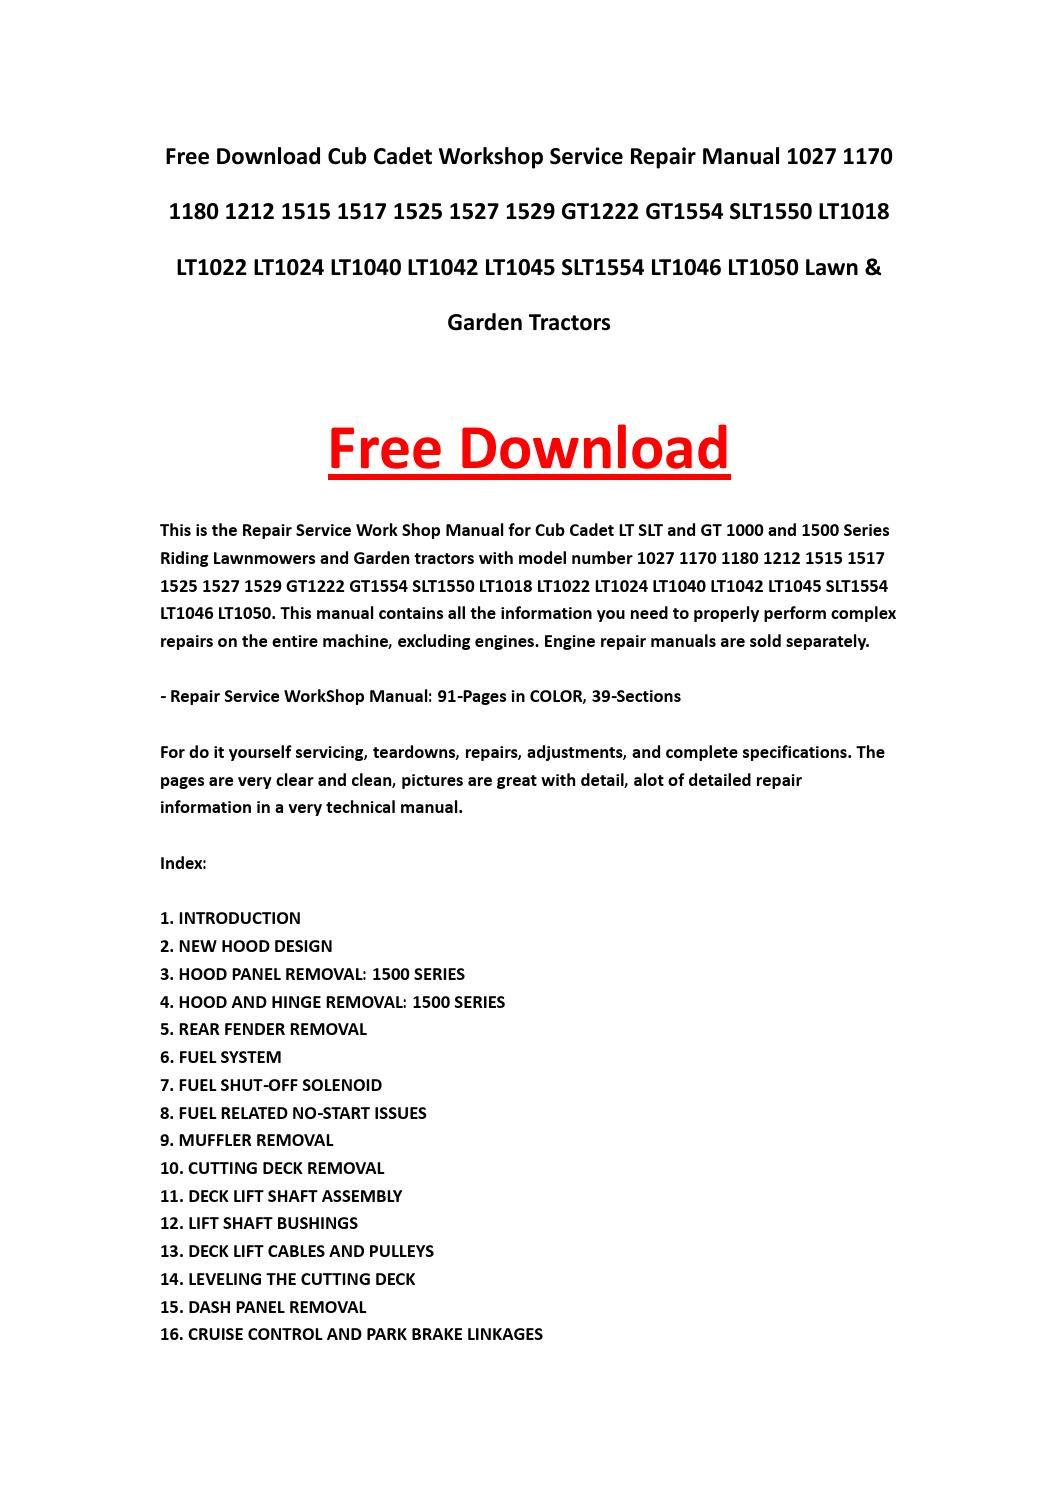 Cub Cadet Workshop Service Repair Manual 1027 1170 1180